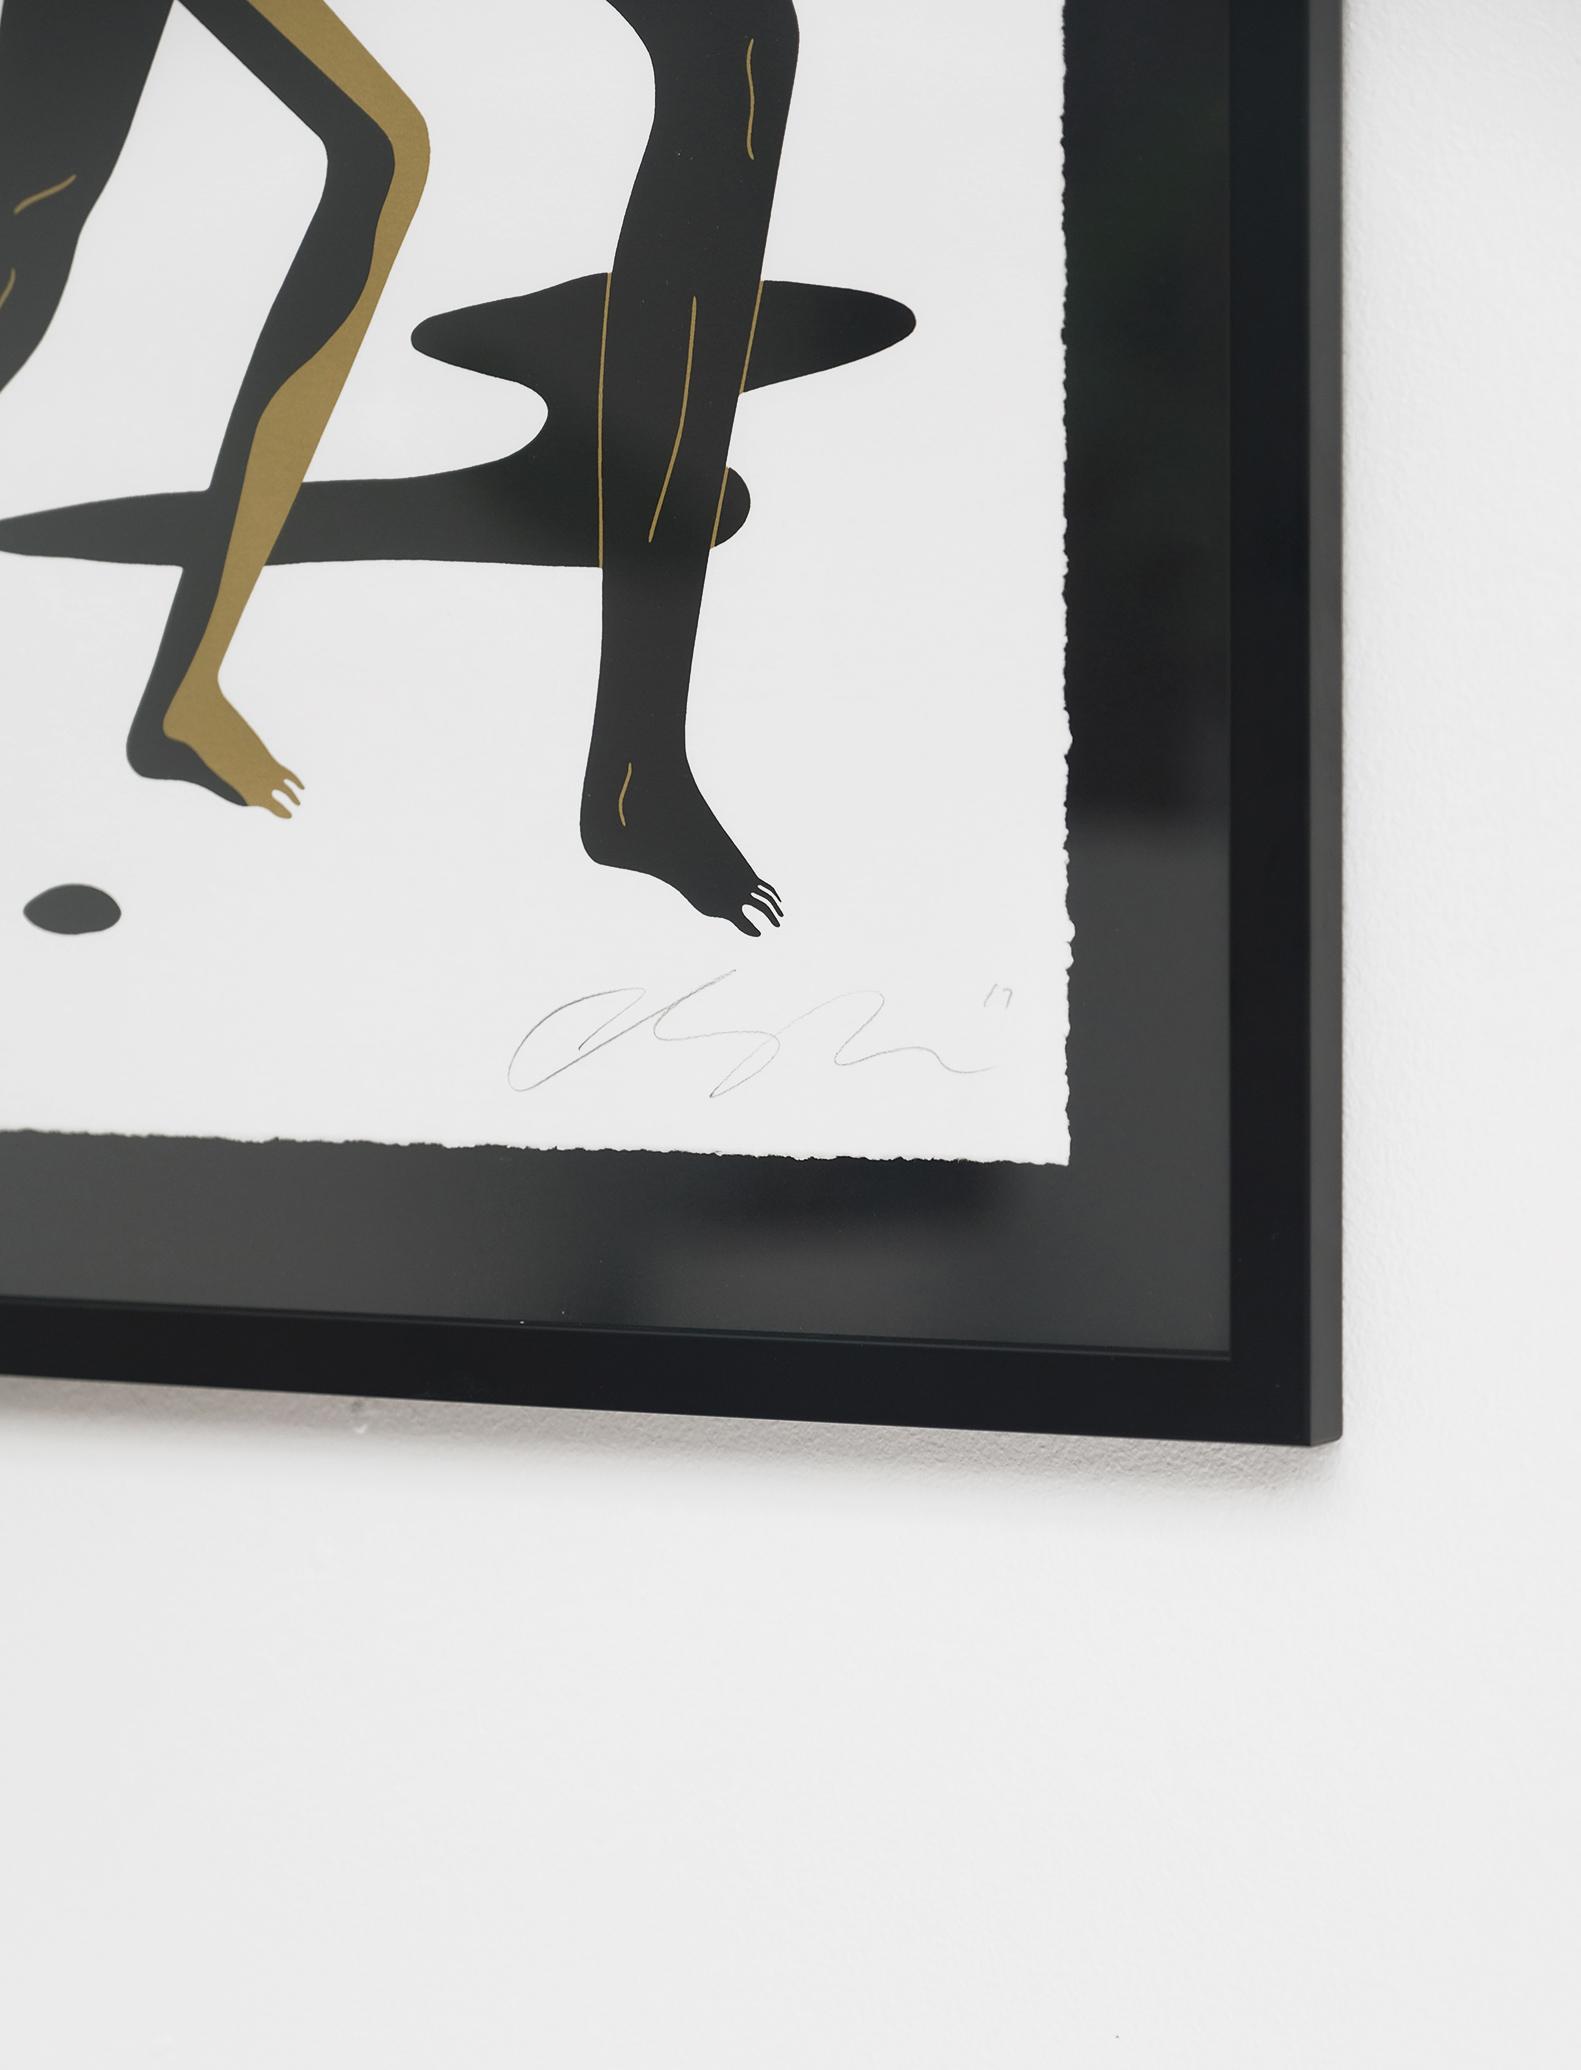 Cleon Peterson Silk Screen Print